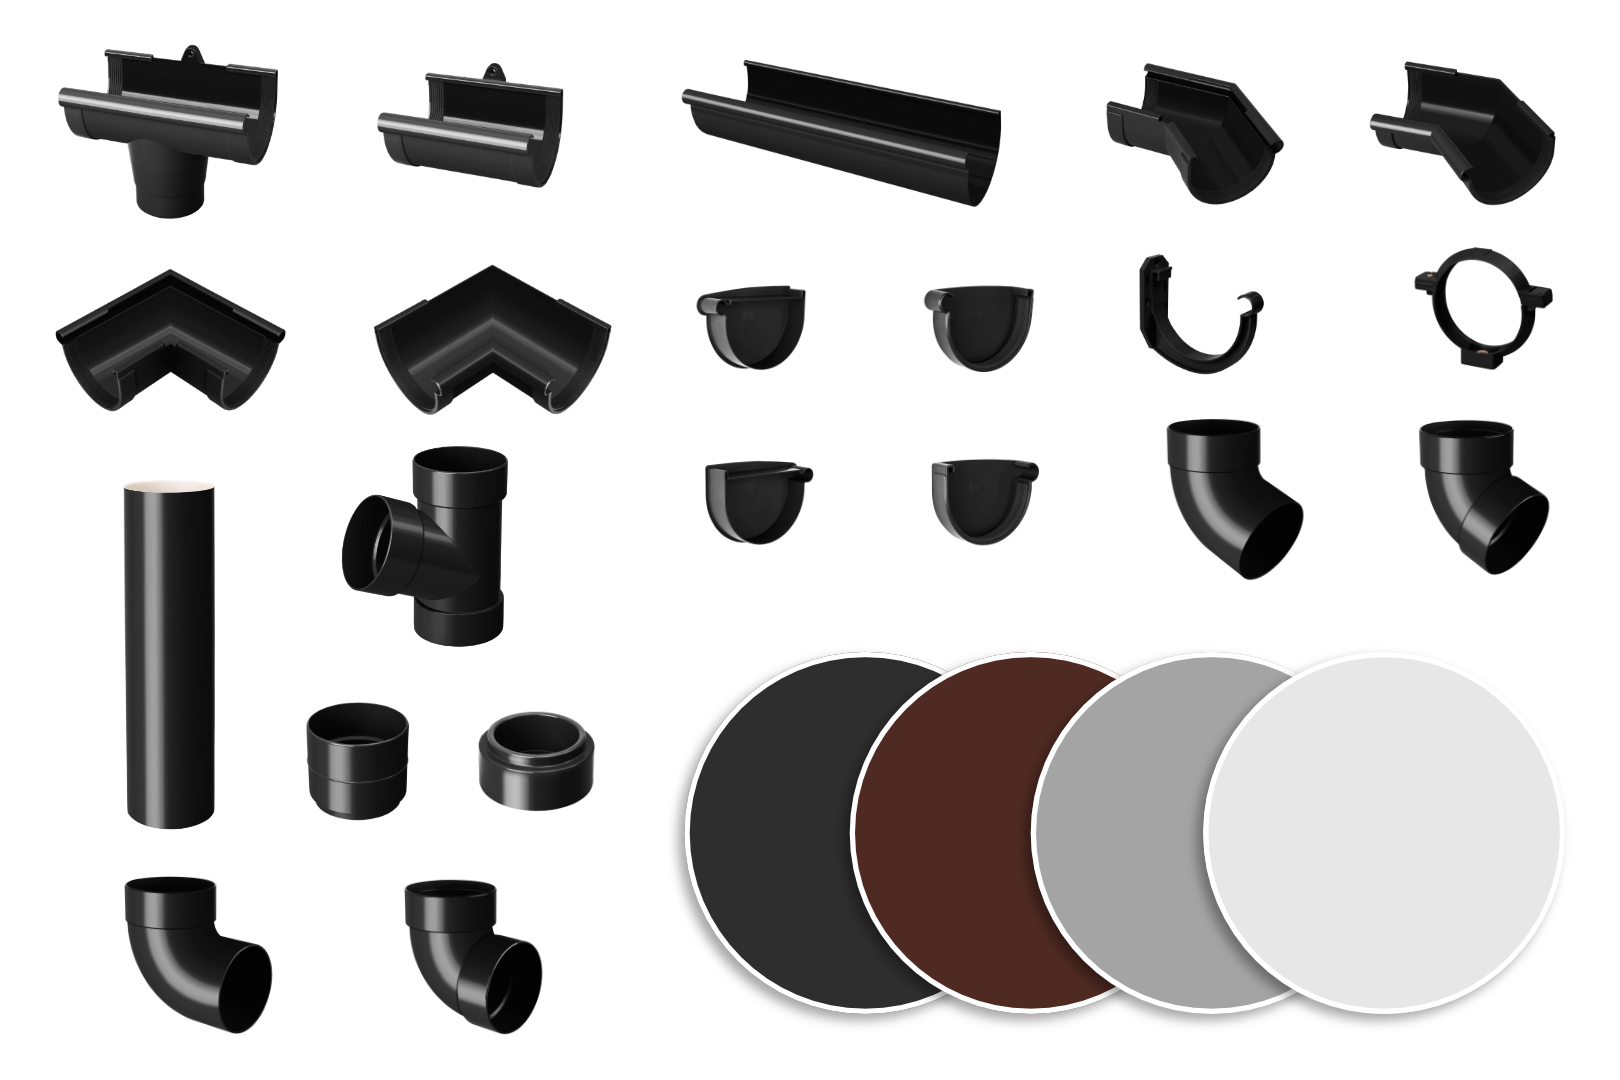 Regenrinnen Komponenten | Dachflächen < 100m² | PVC in 4 Farben | RainWay S